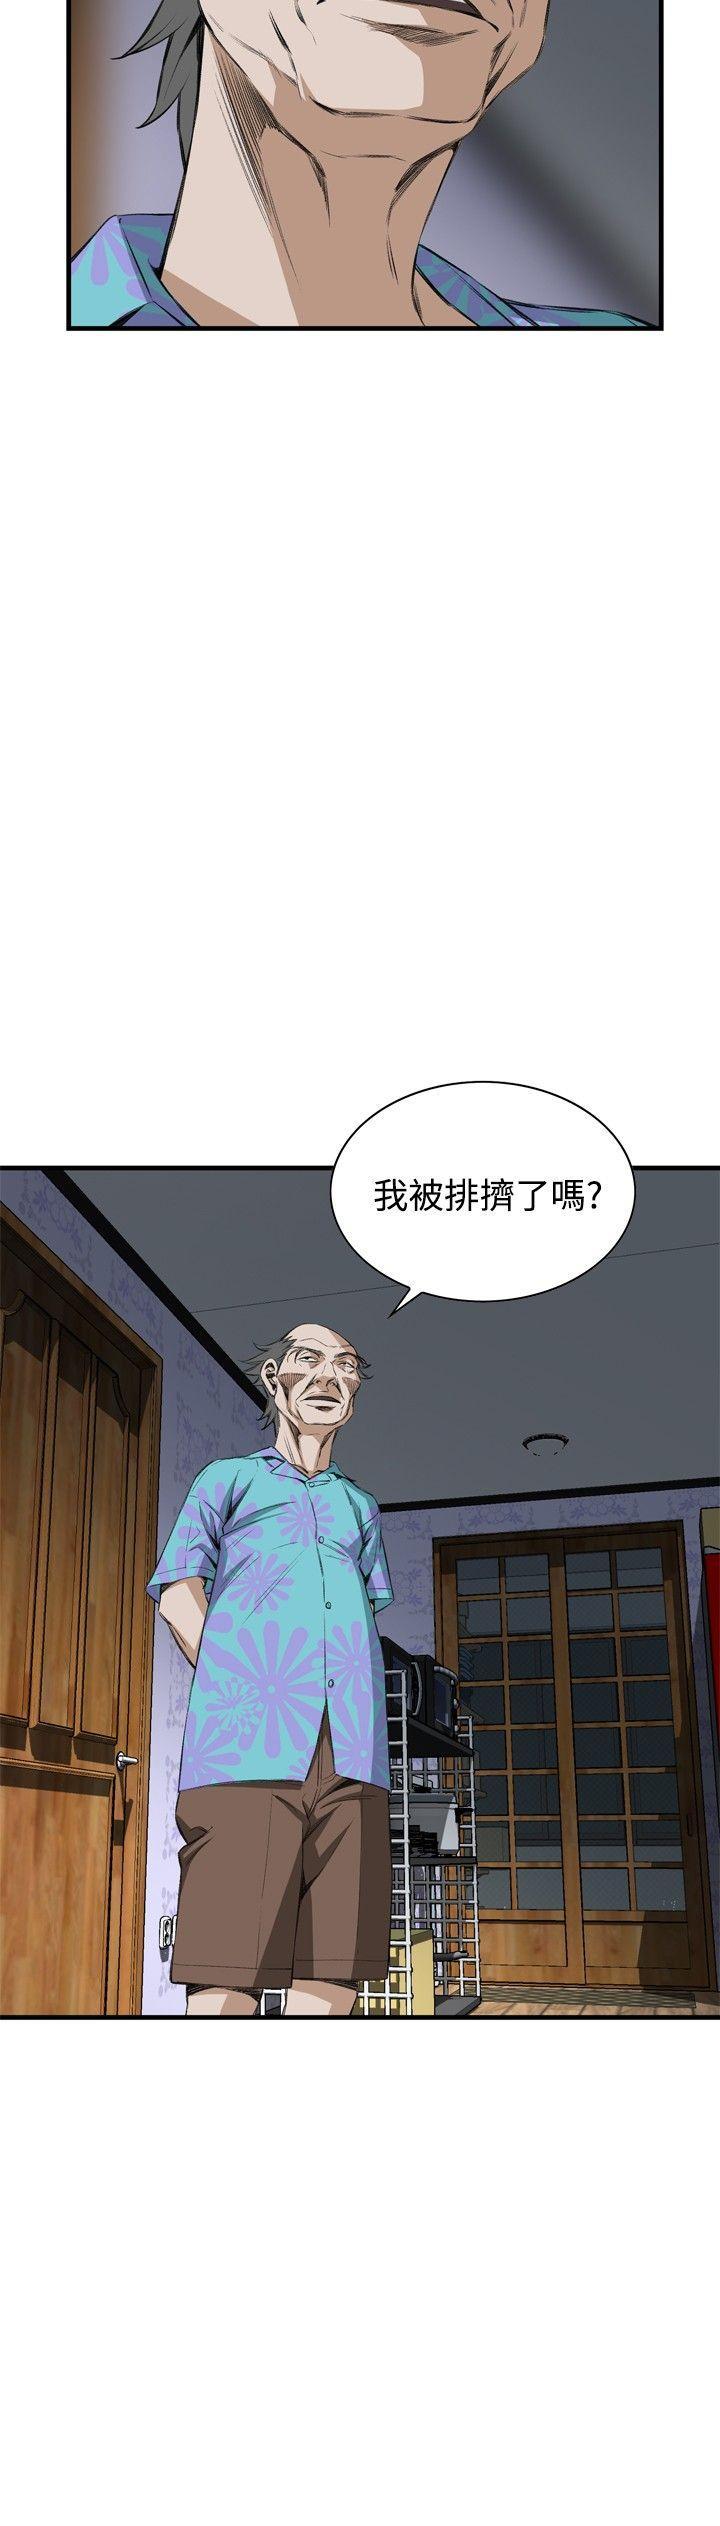 Take a Peek 偷窥 Ch.39~55 [Chinese]中文 512